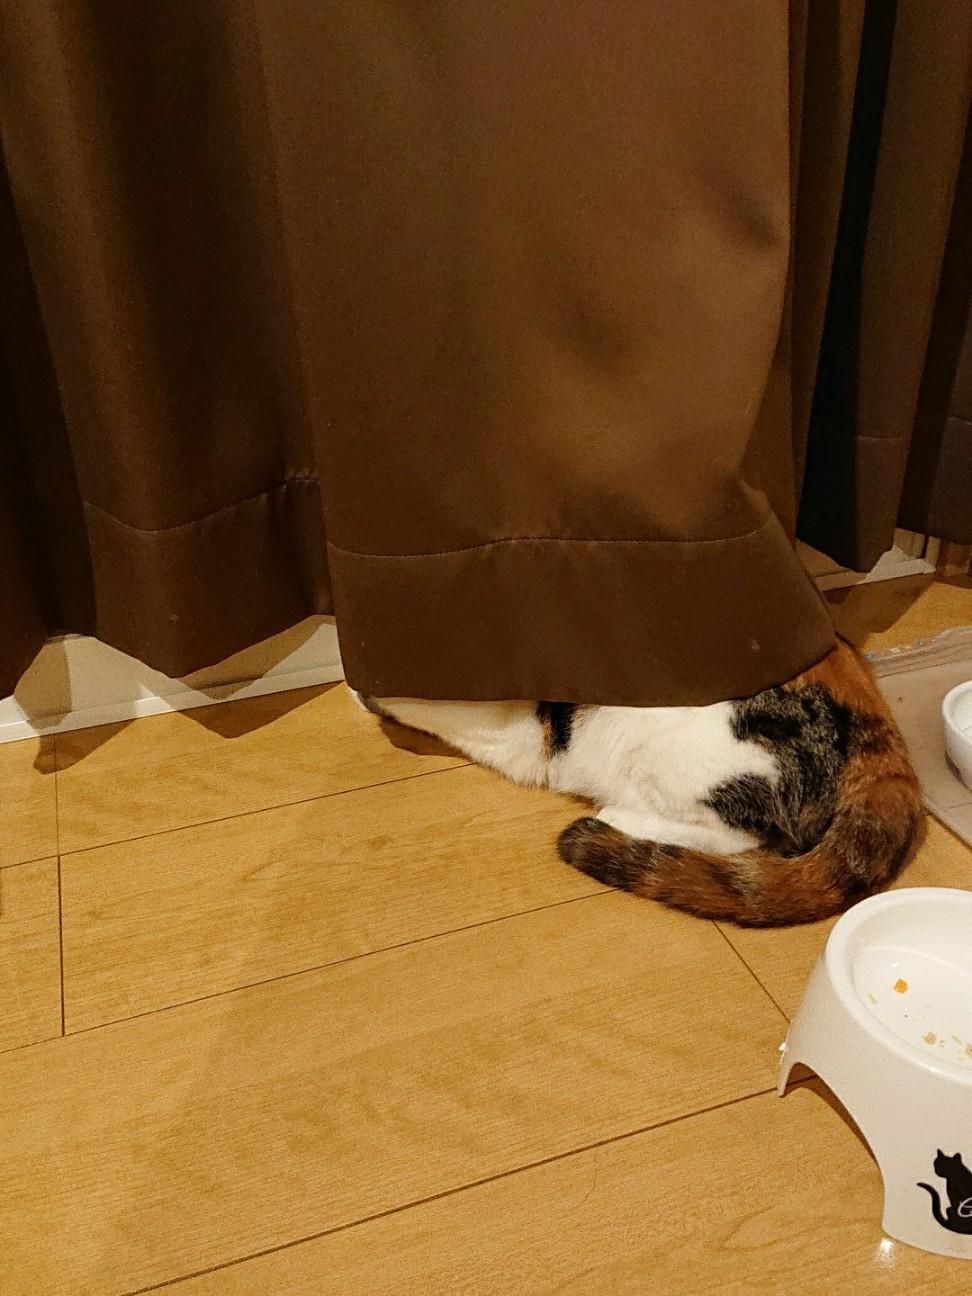 f:id:Three_Traveling_Cats:20190909224619j:image